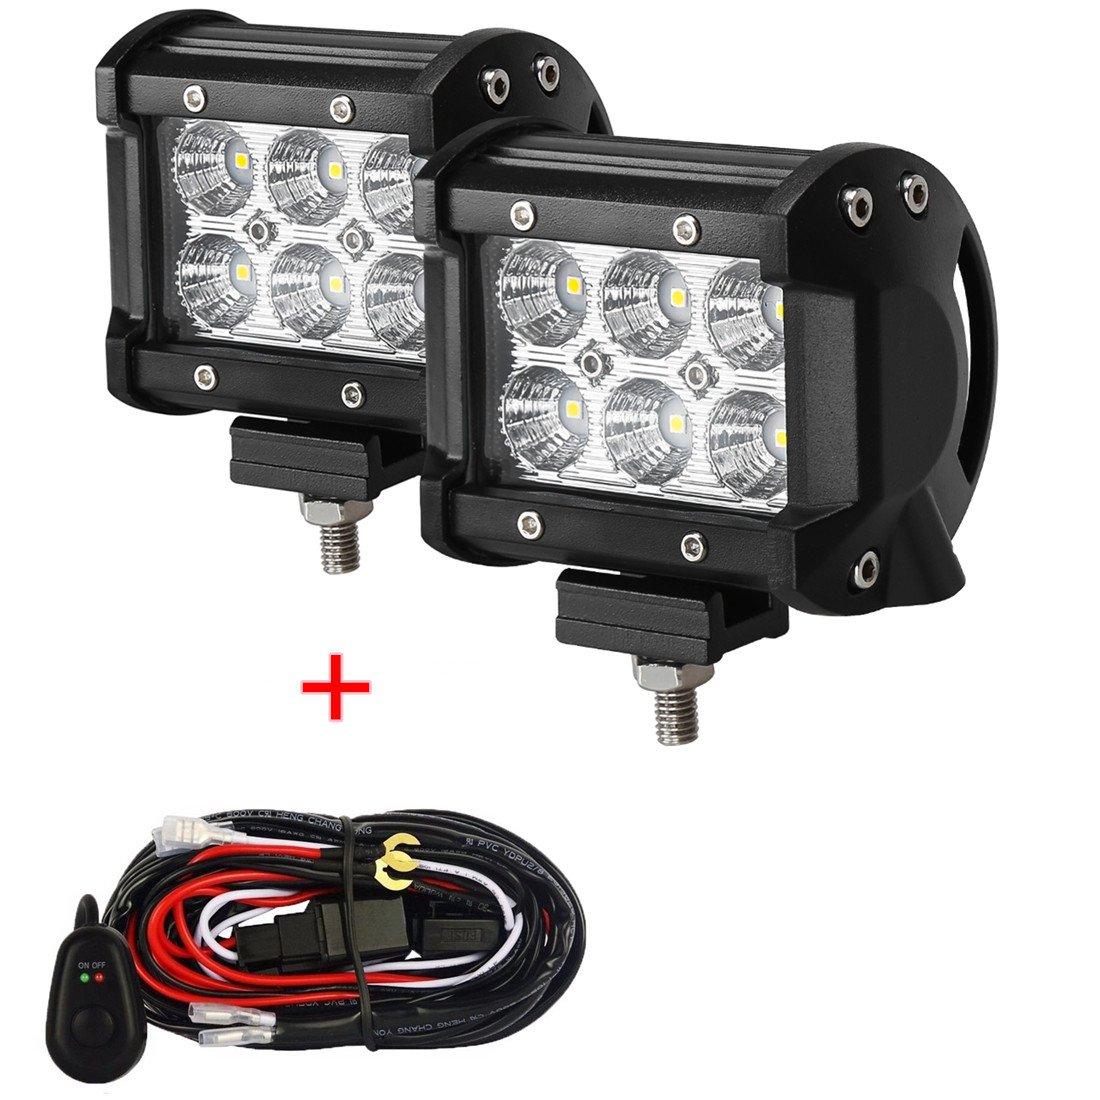 4Pcs 4 Flood Beam 60 degree Waterproof for Off-road Car ATV SUV Jeep Boat 18W CREE LED Work Light Bar